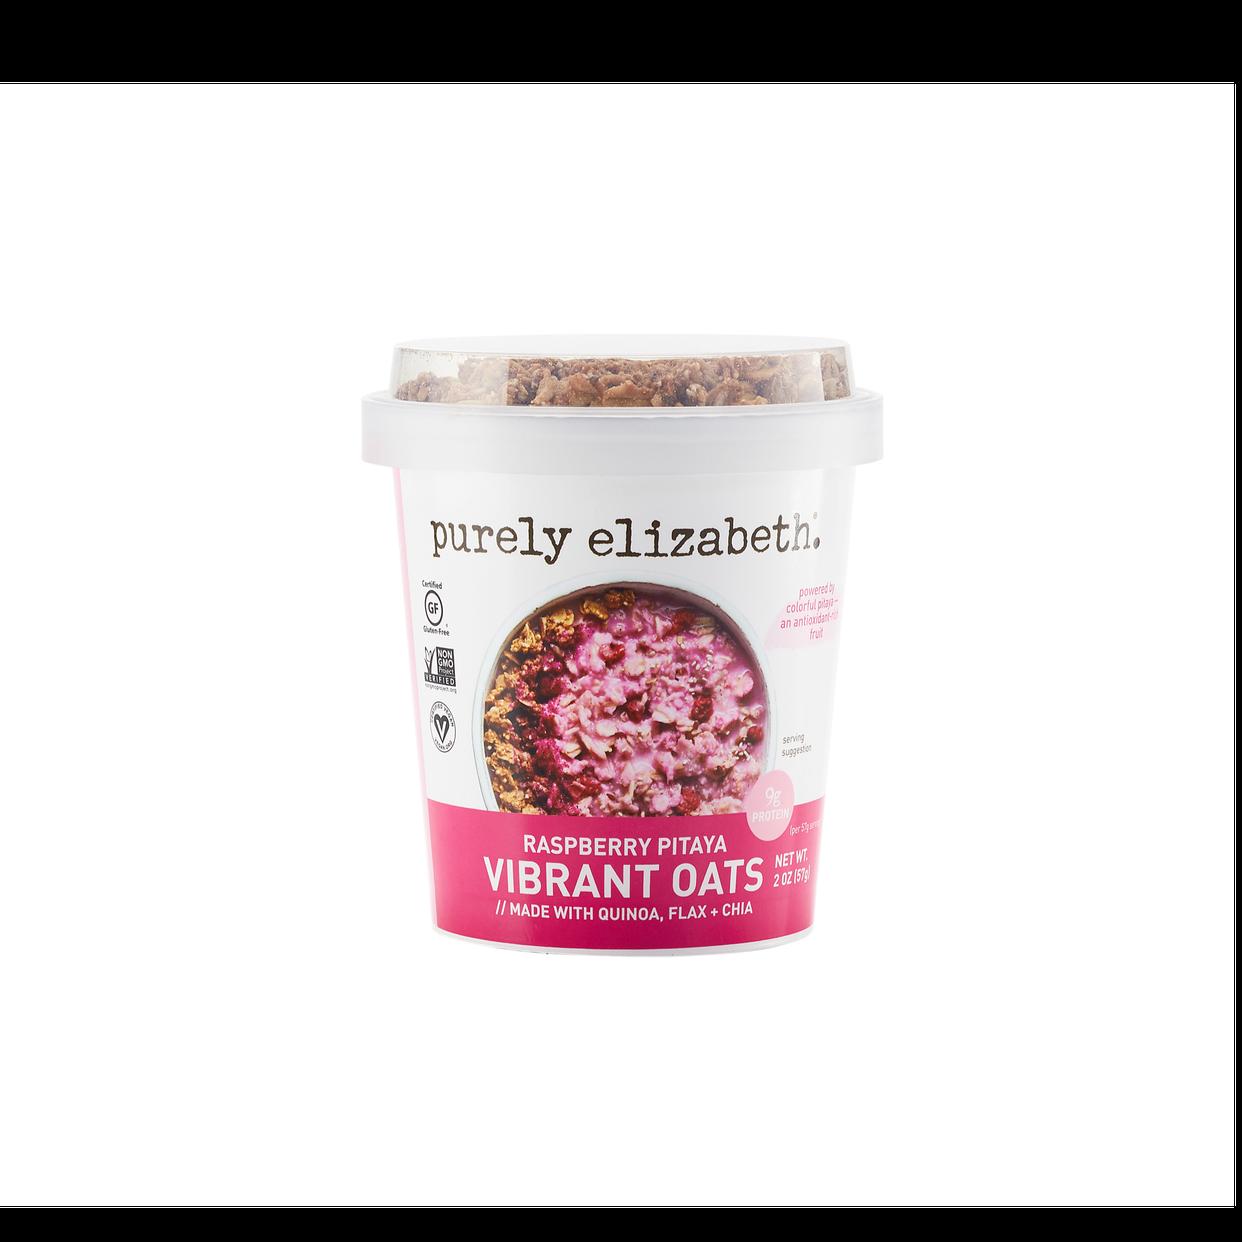 Purely Elizabeth Vibrant Oats Raspberry Pitaya - Snap Kitchen ...